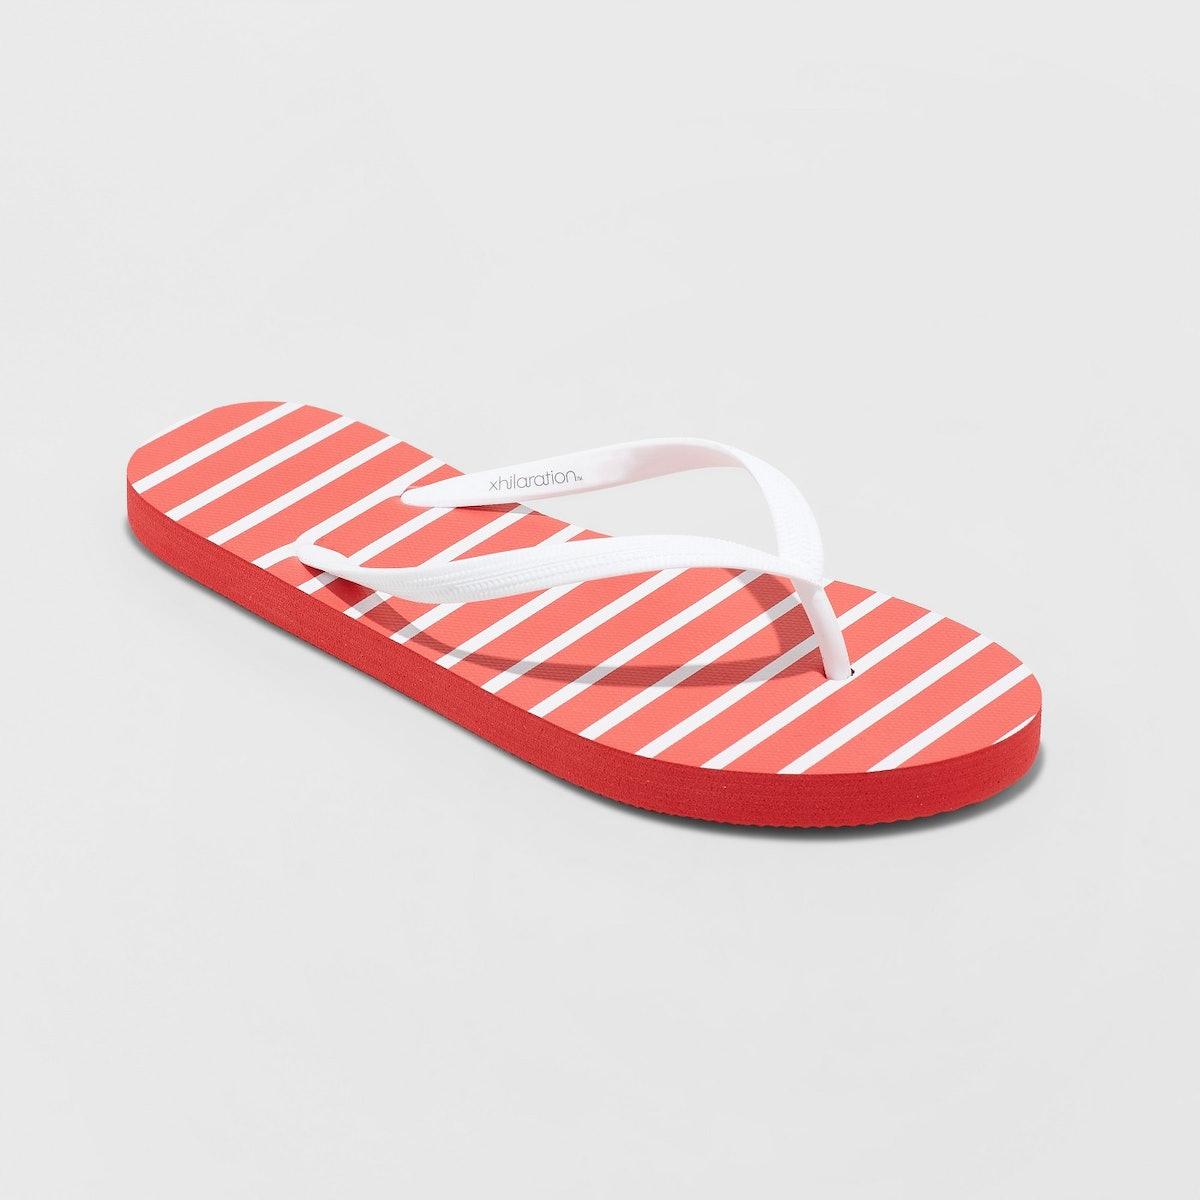 Women's Letty Flip-Flop Sandal - Xhilaration